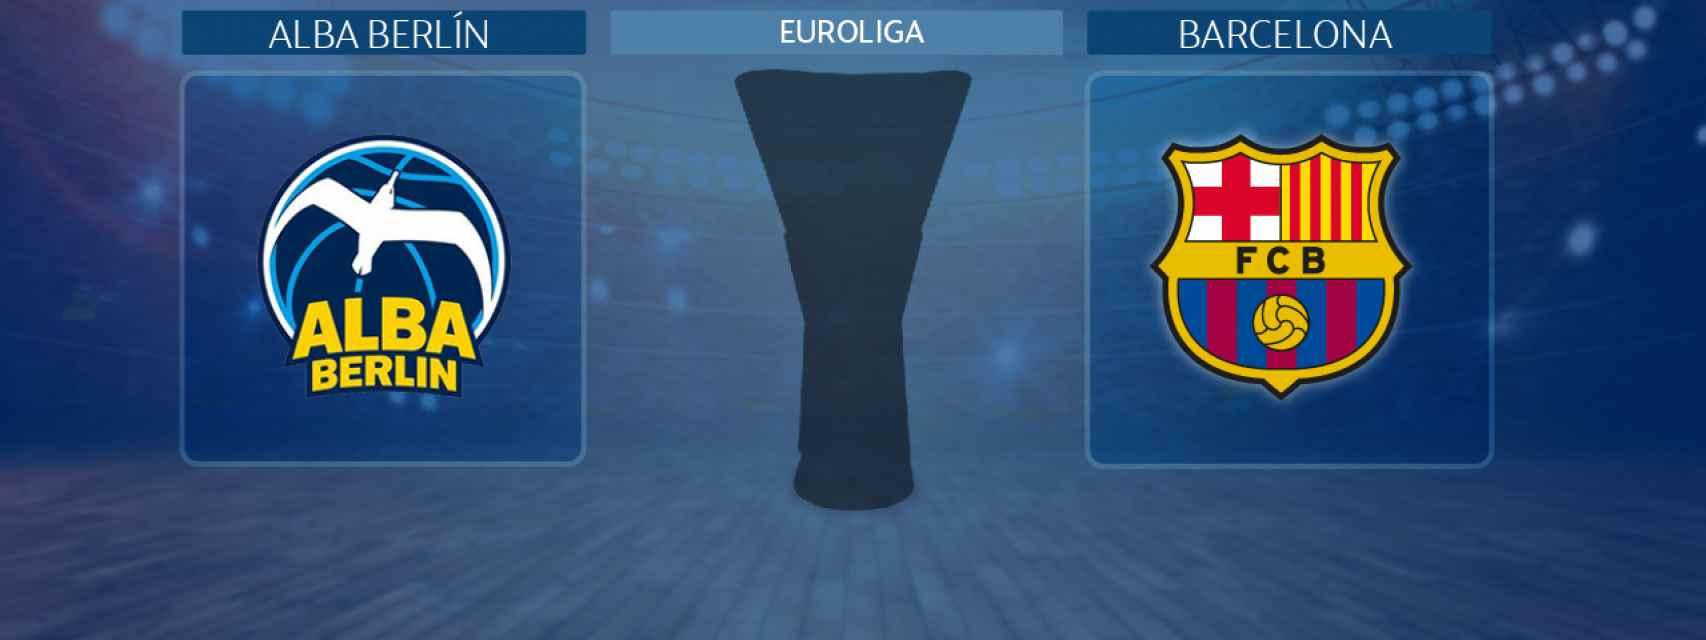 Alba Berlín - Barcelona, partido de la Euroliga